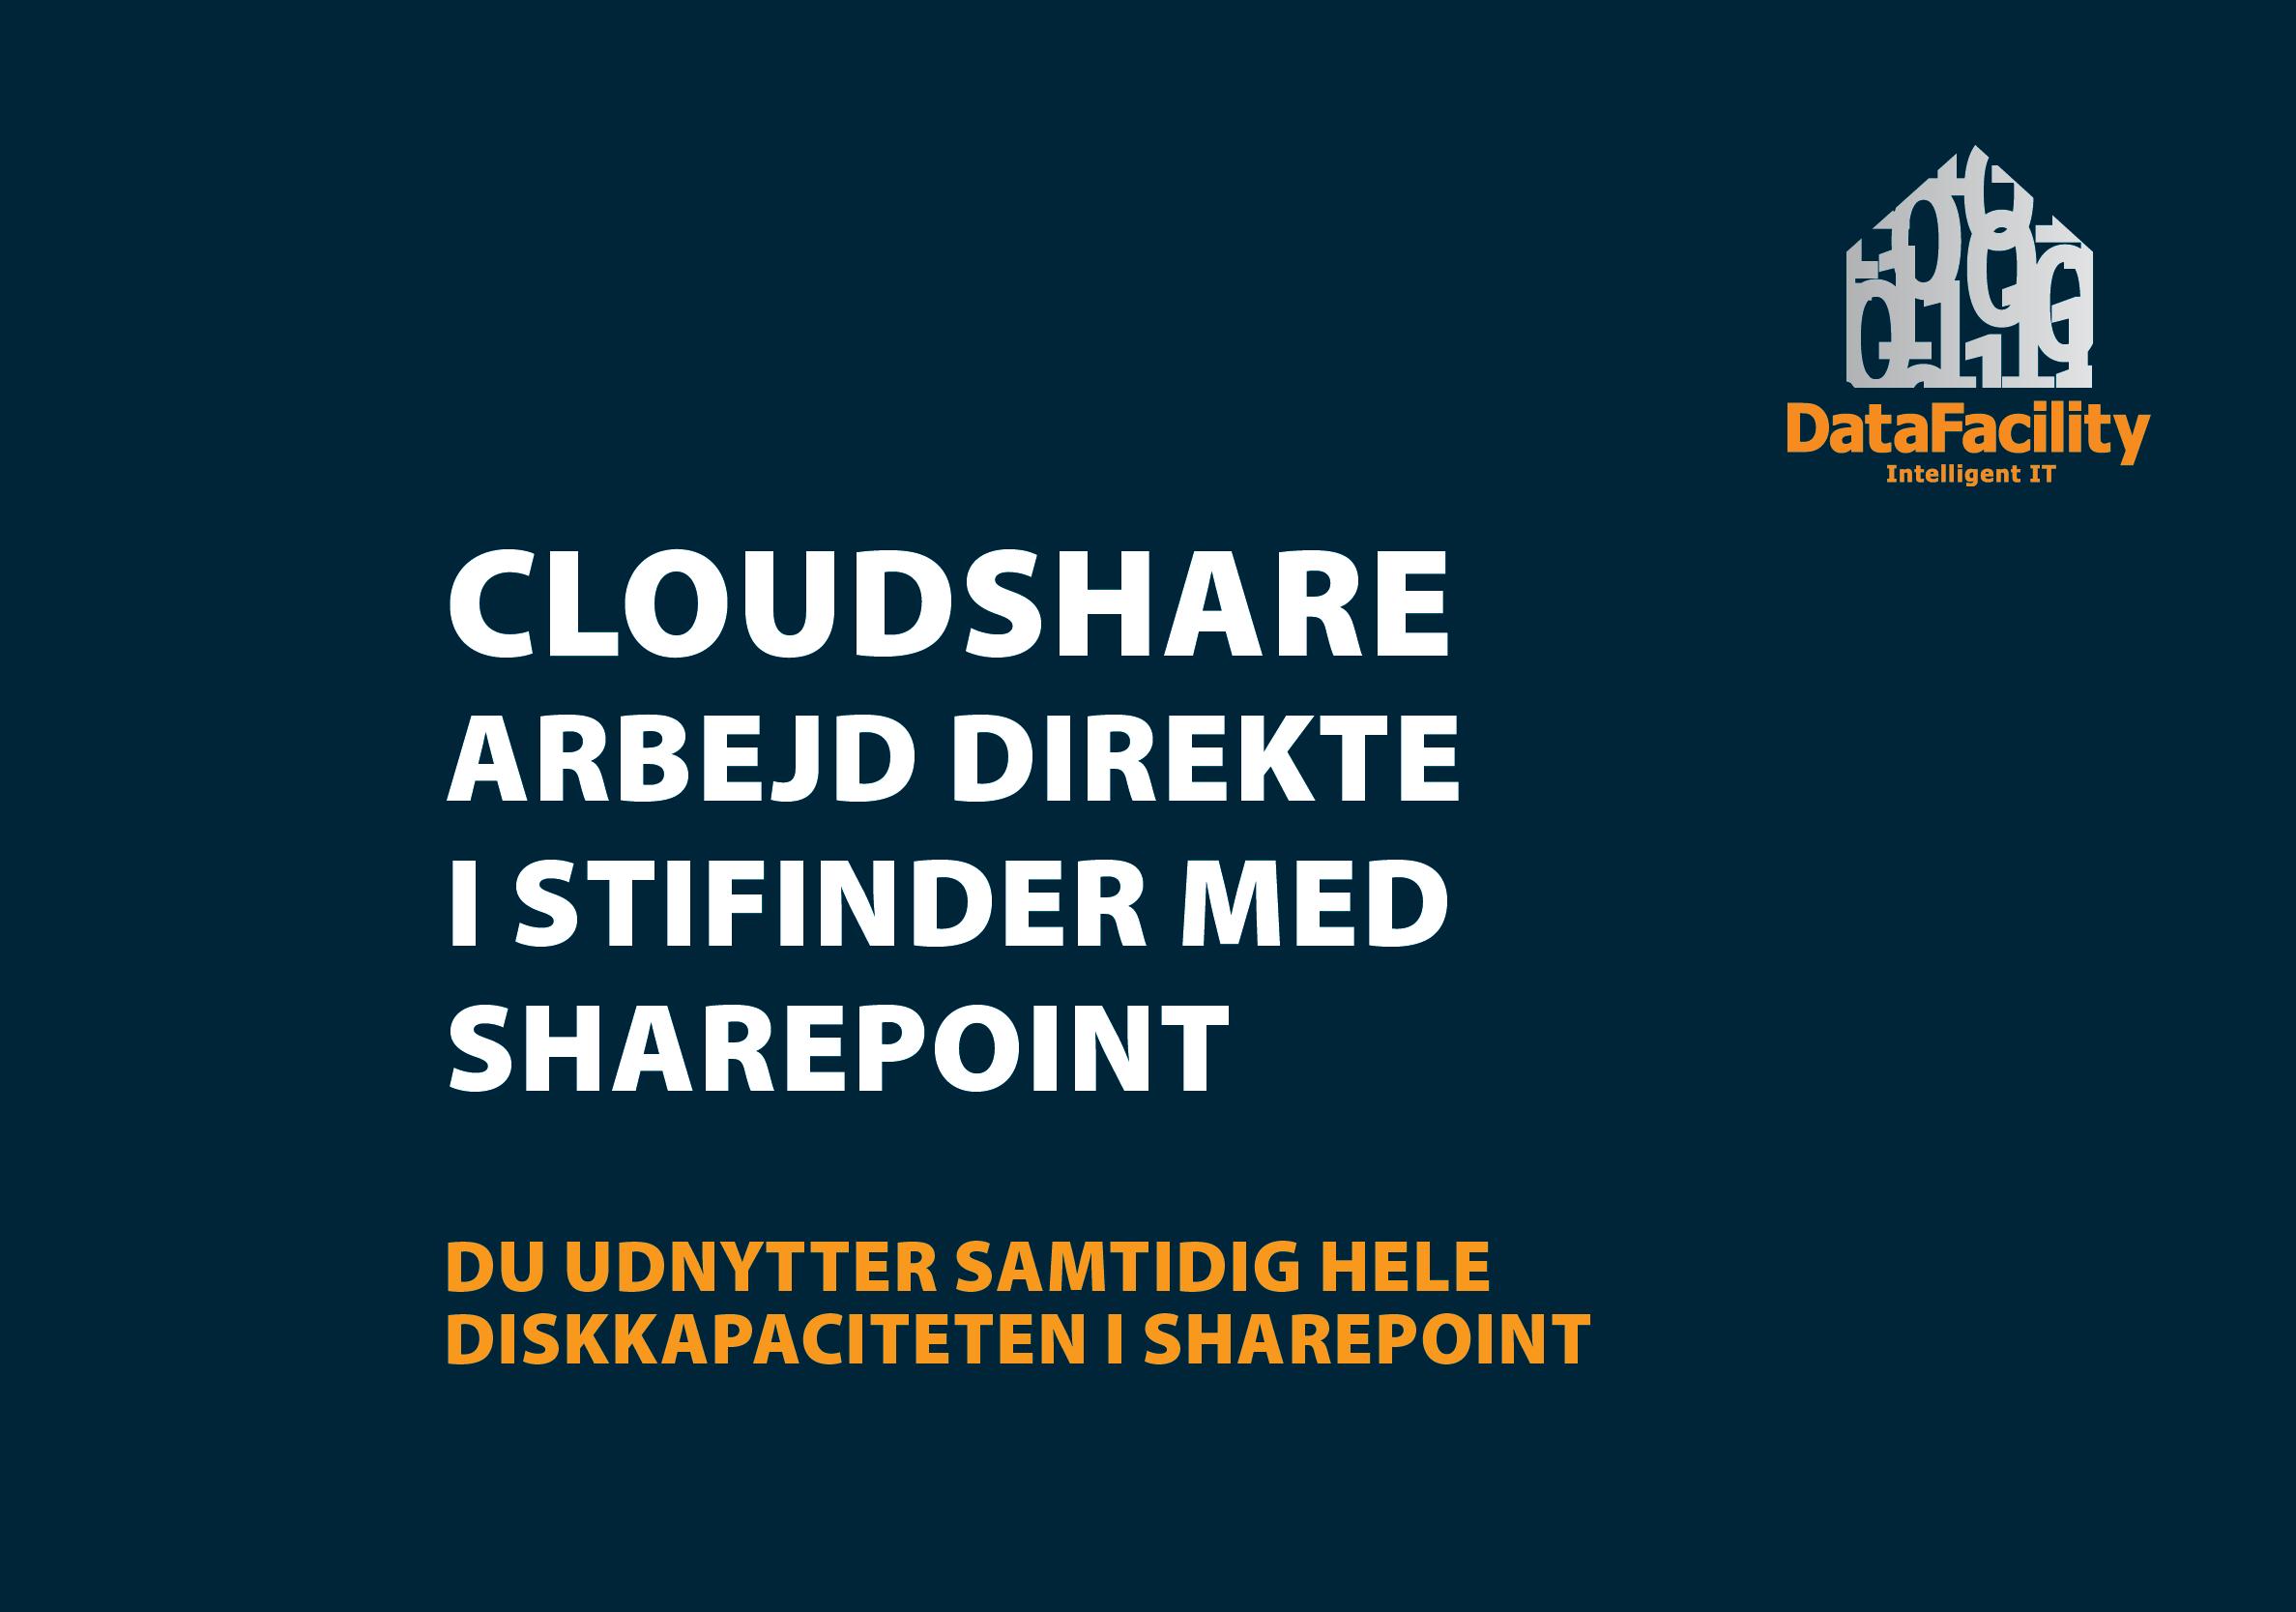 Cloudshare - udvidelse til Microsoft Sharepoint. DataFacility